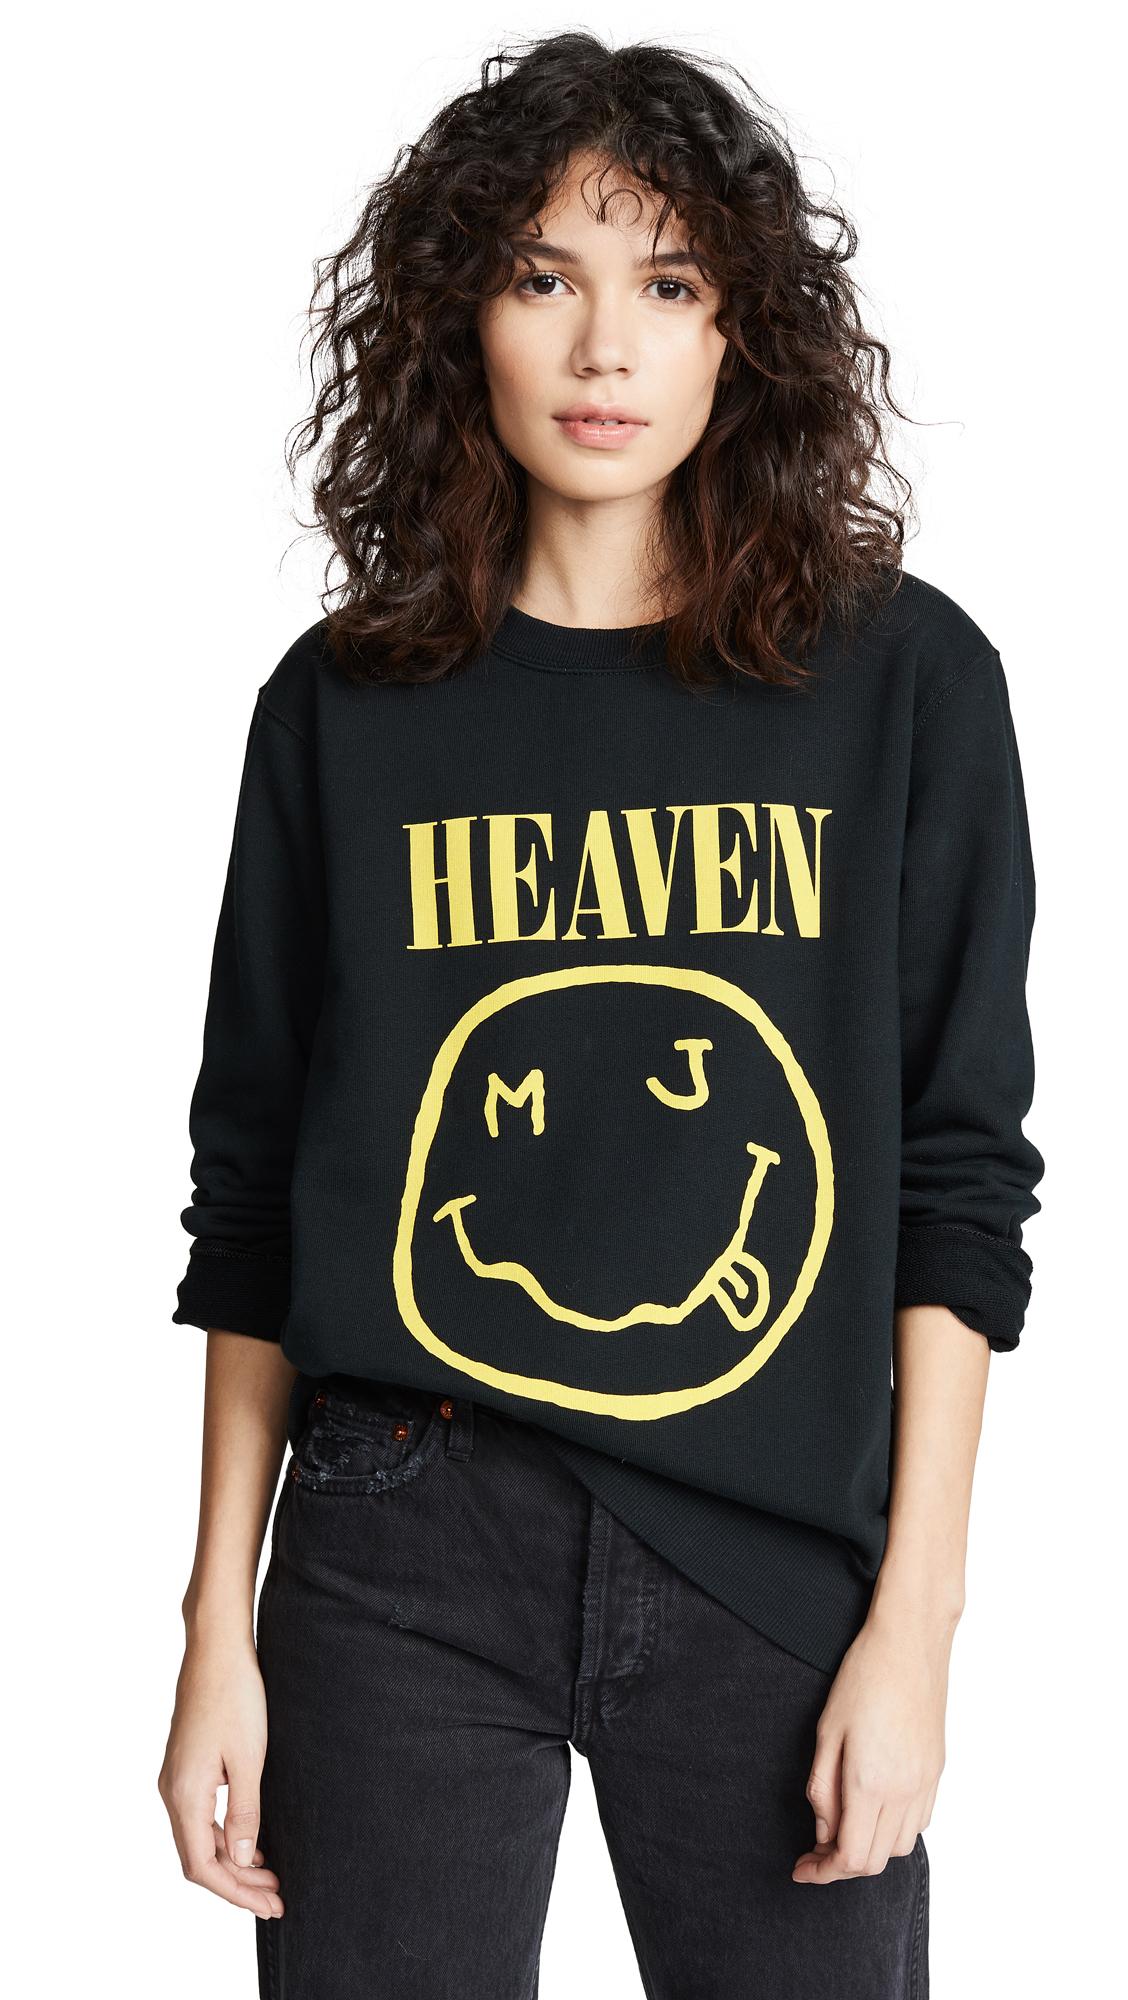 Redux Grunge Bootleg Sweatshirt in Black